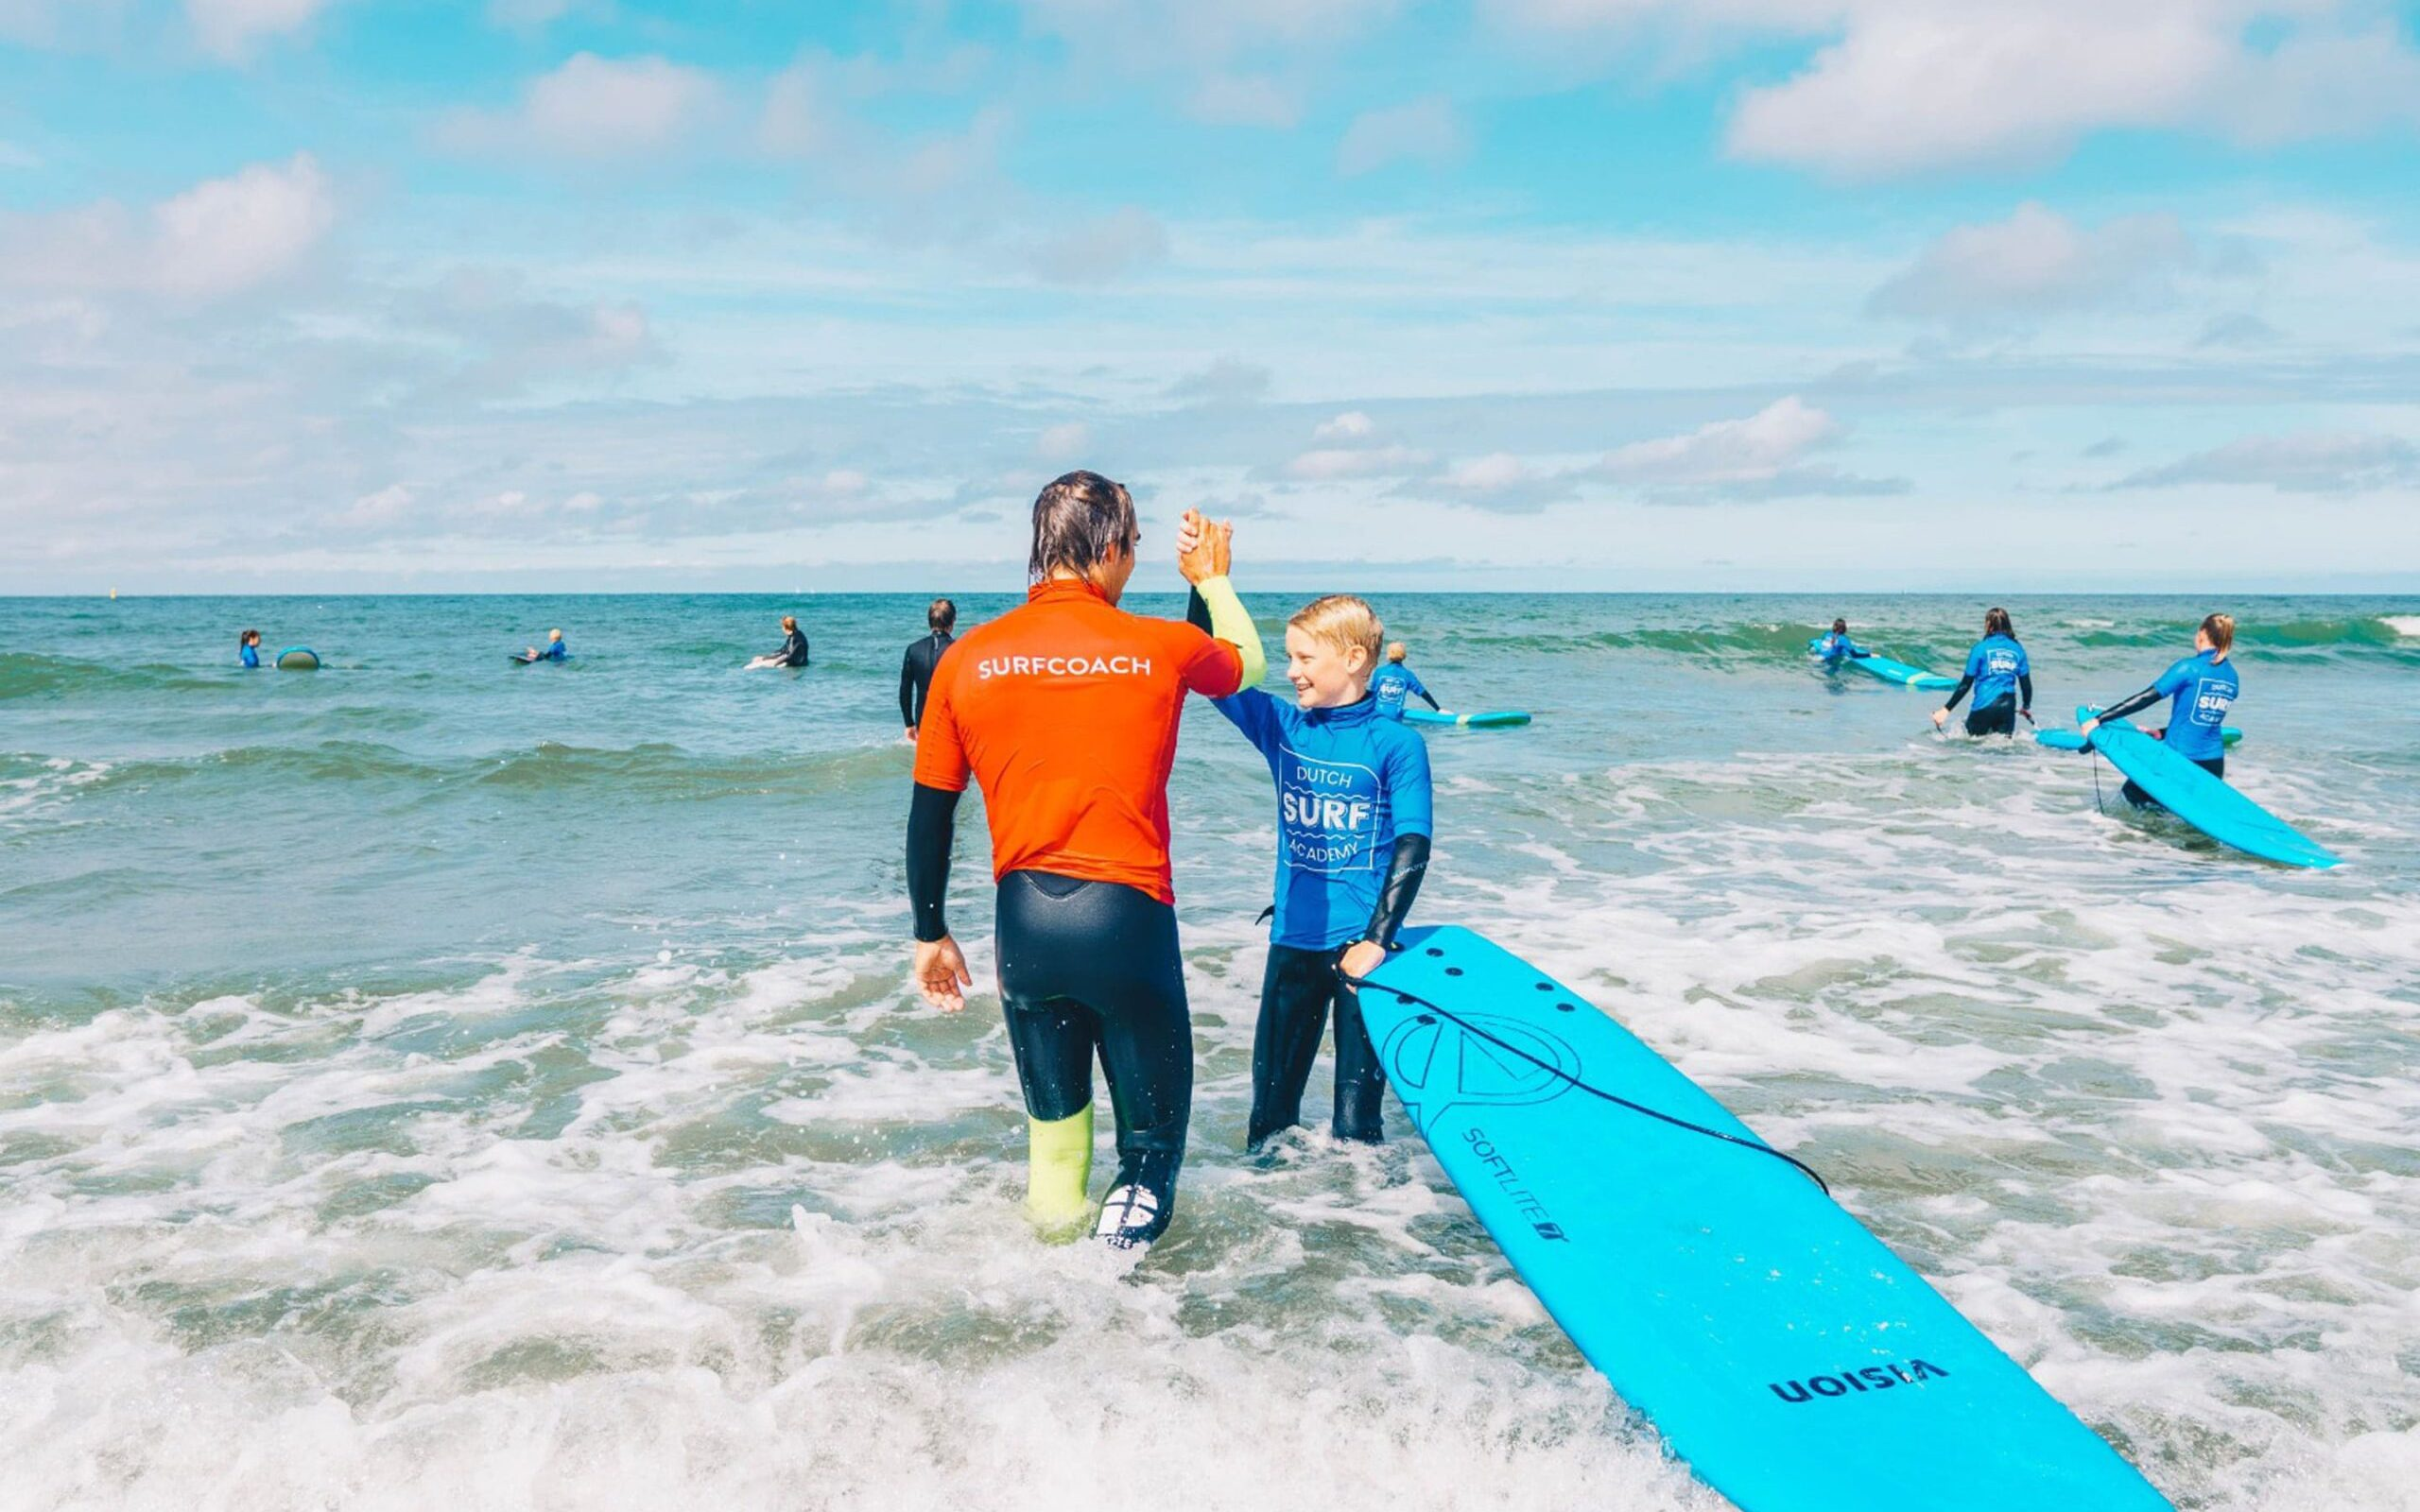 surfcoach highfive surfles